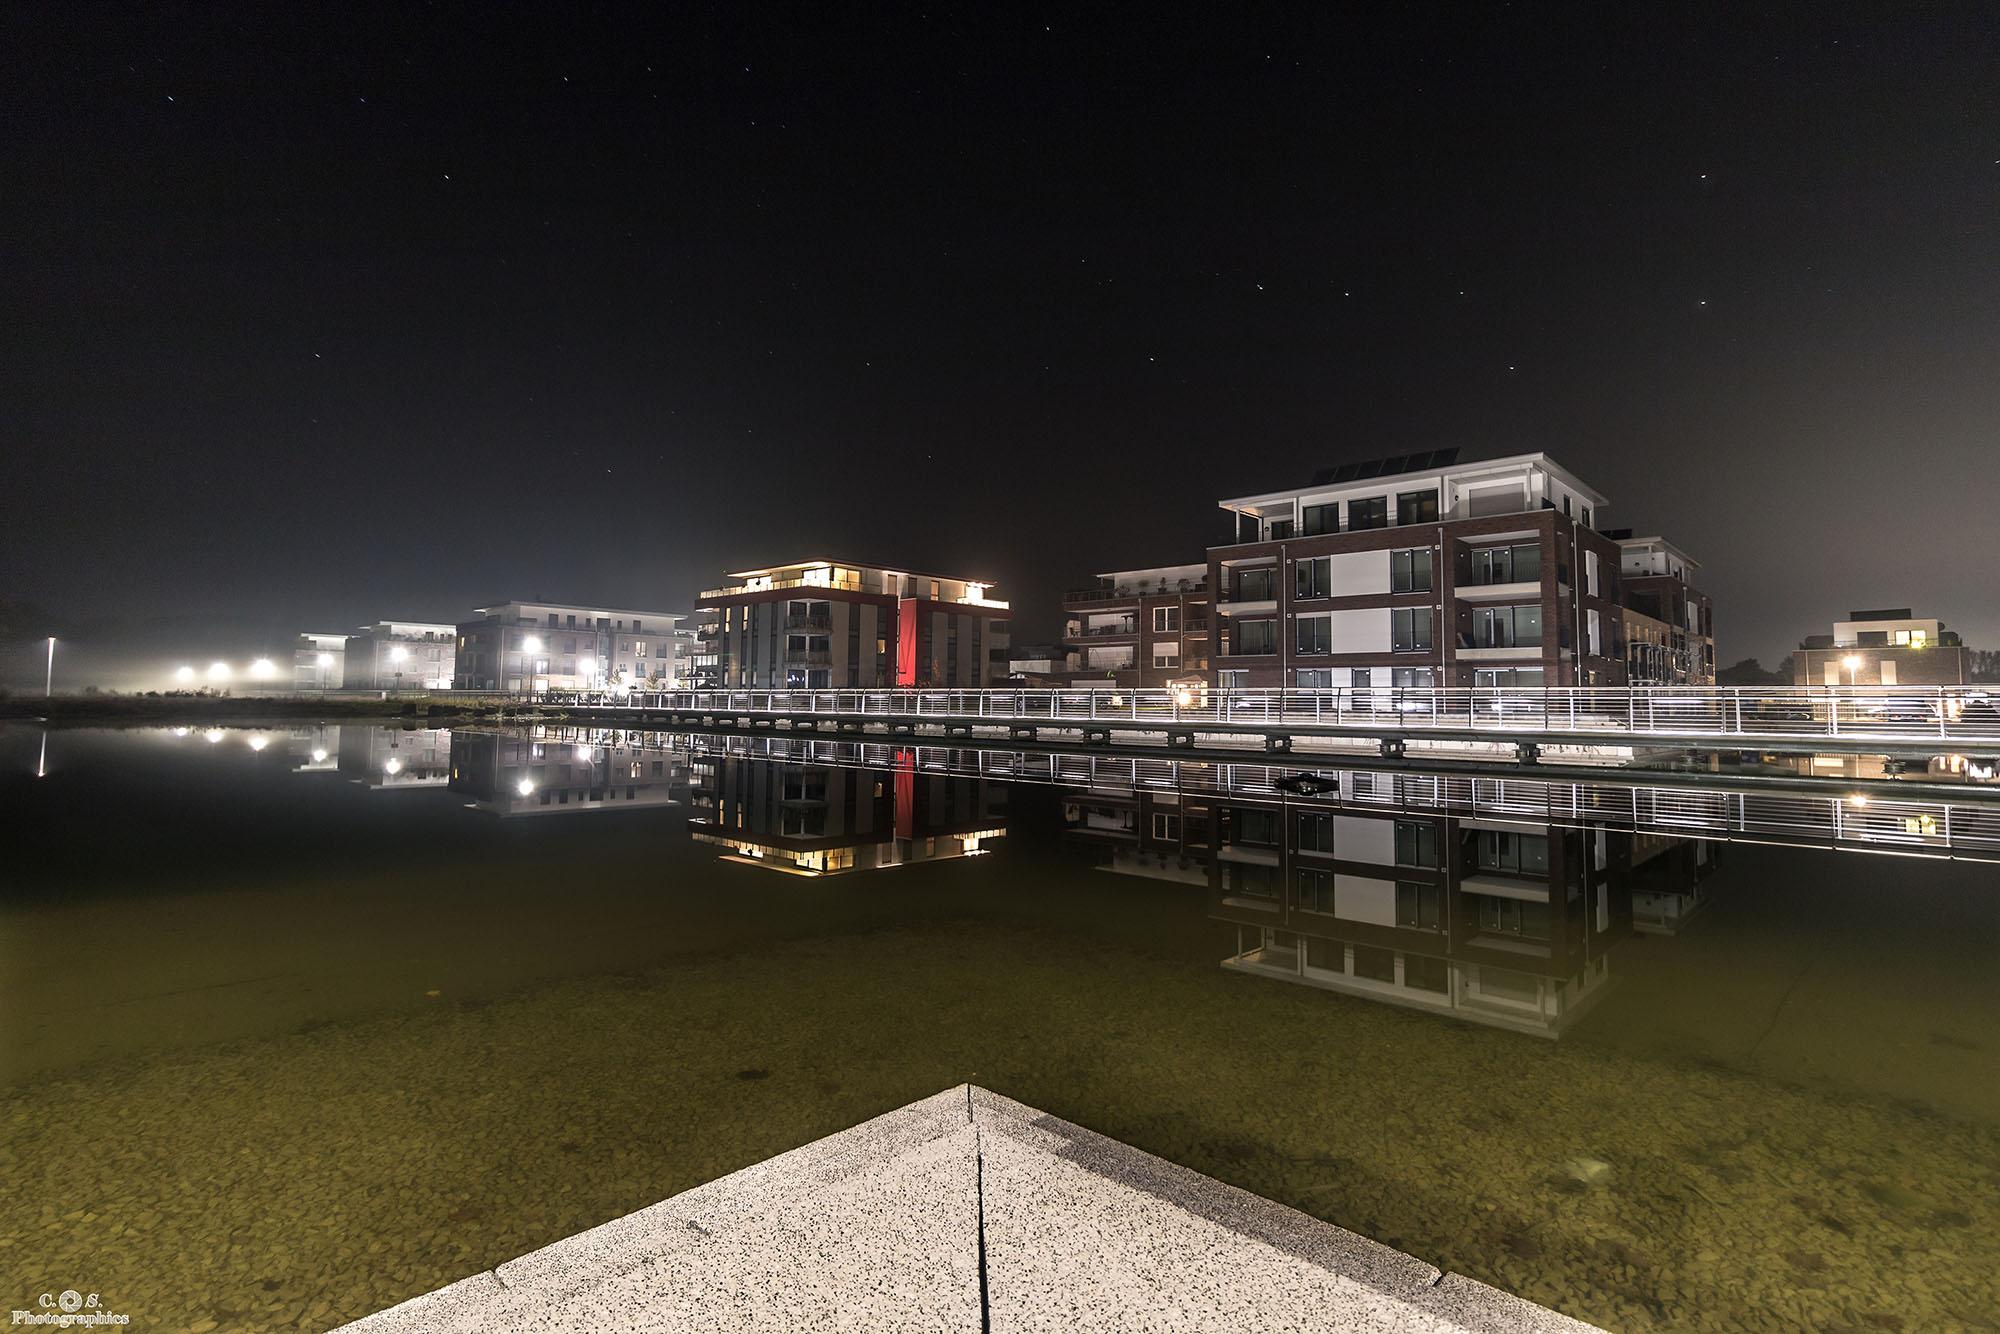 Emsauenpark, Germany